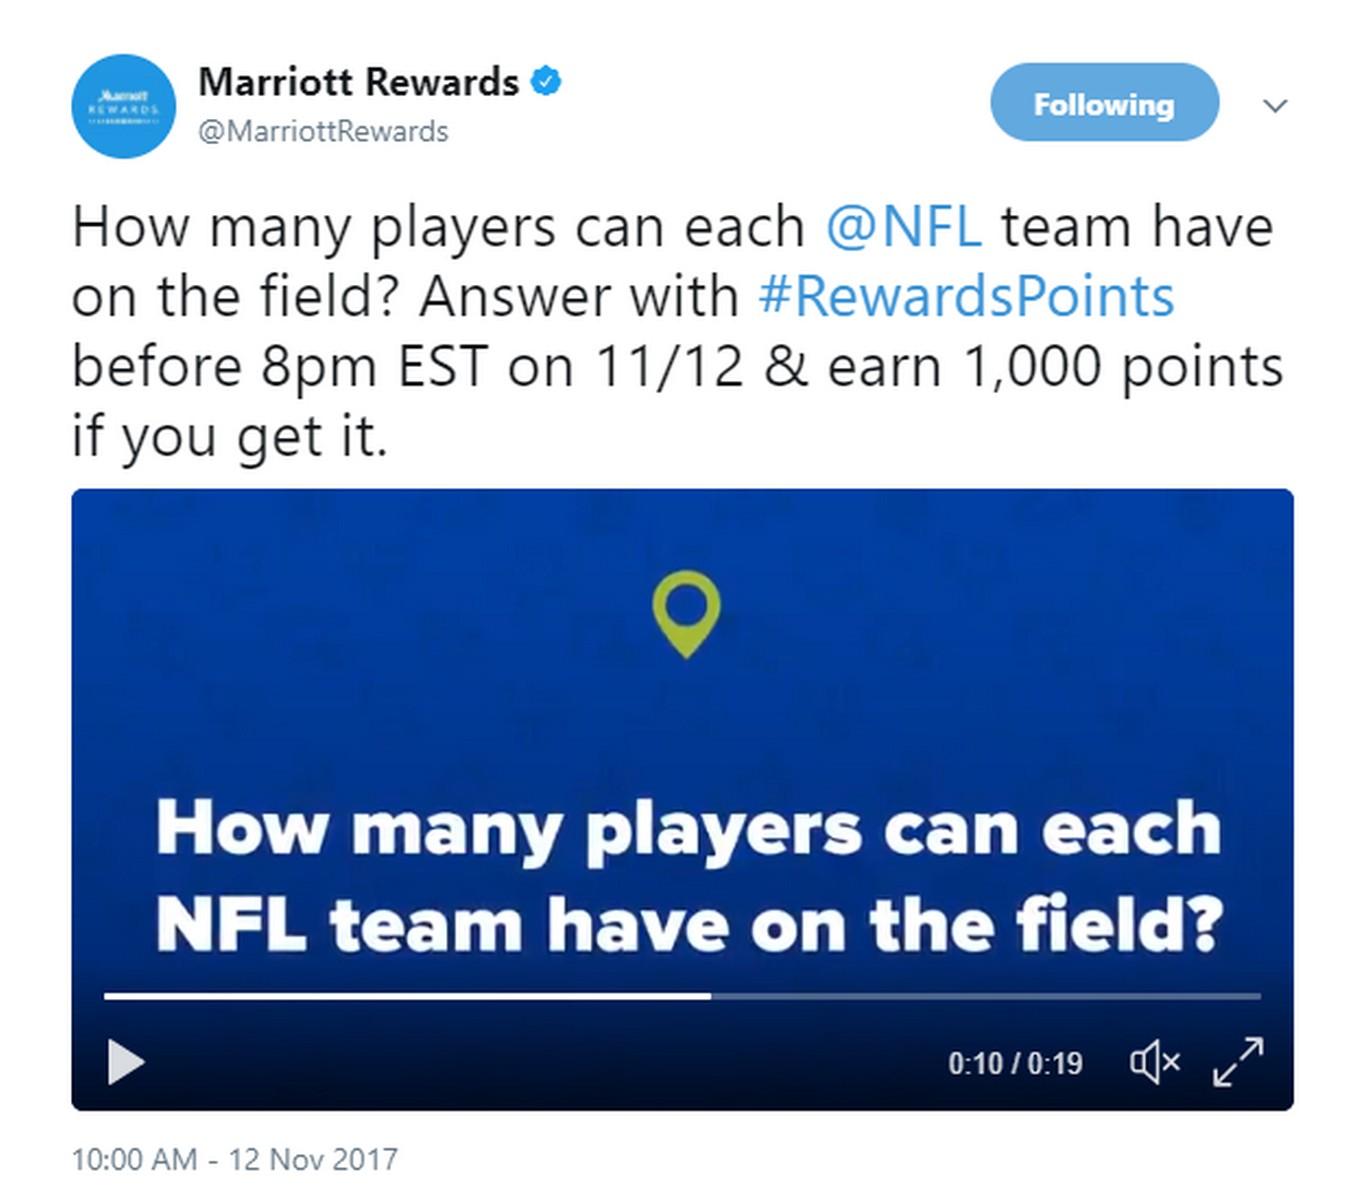 Easy Marriott Rewards Points